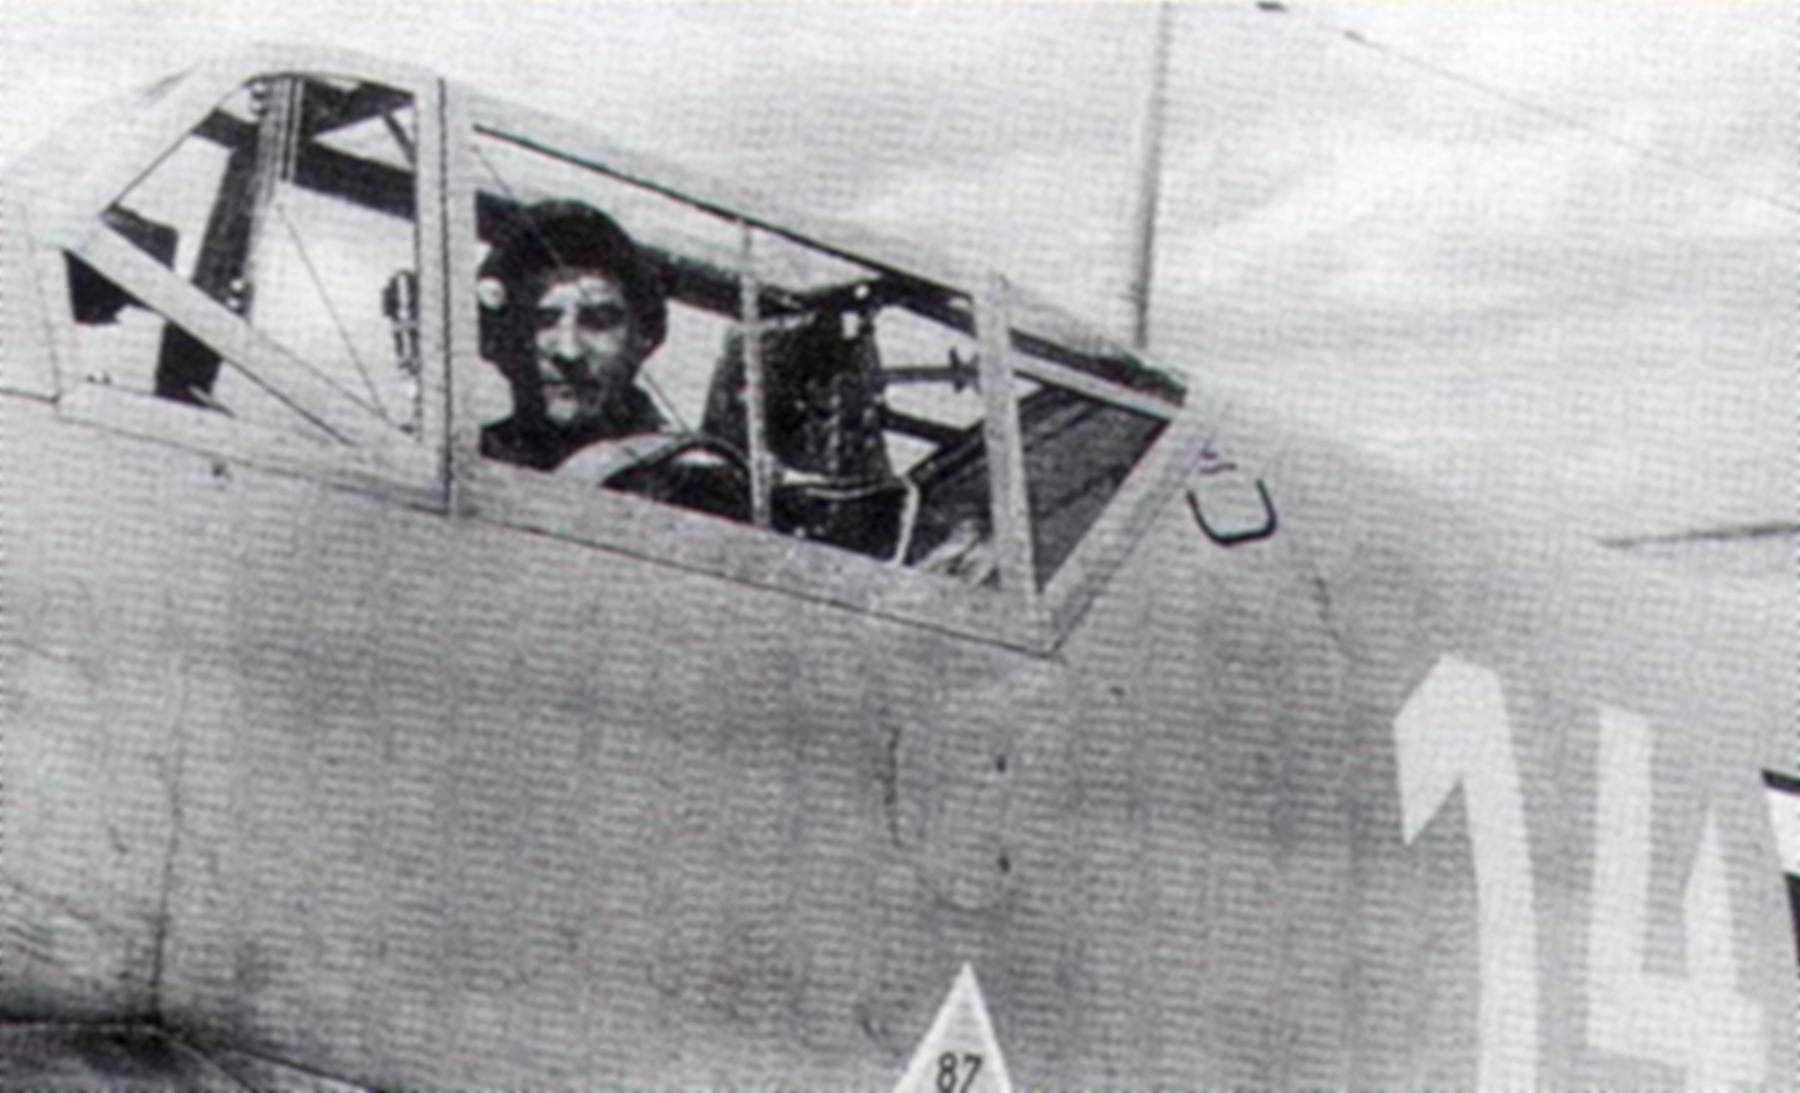 Messerschmitt Bf 109F4Trop 3.JG27 Yellow 14 Hans Joachim Marseille WNr 8693 Martuba Feb 1942 04